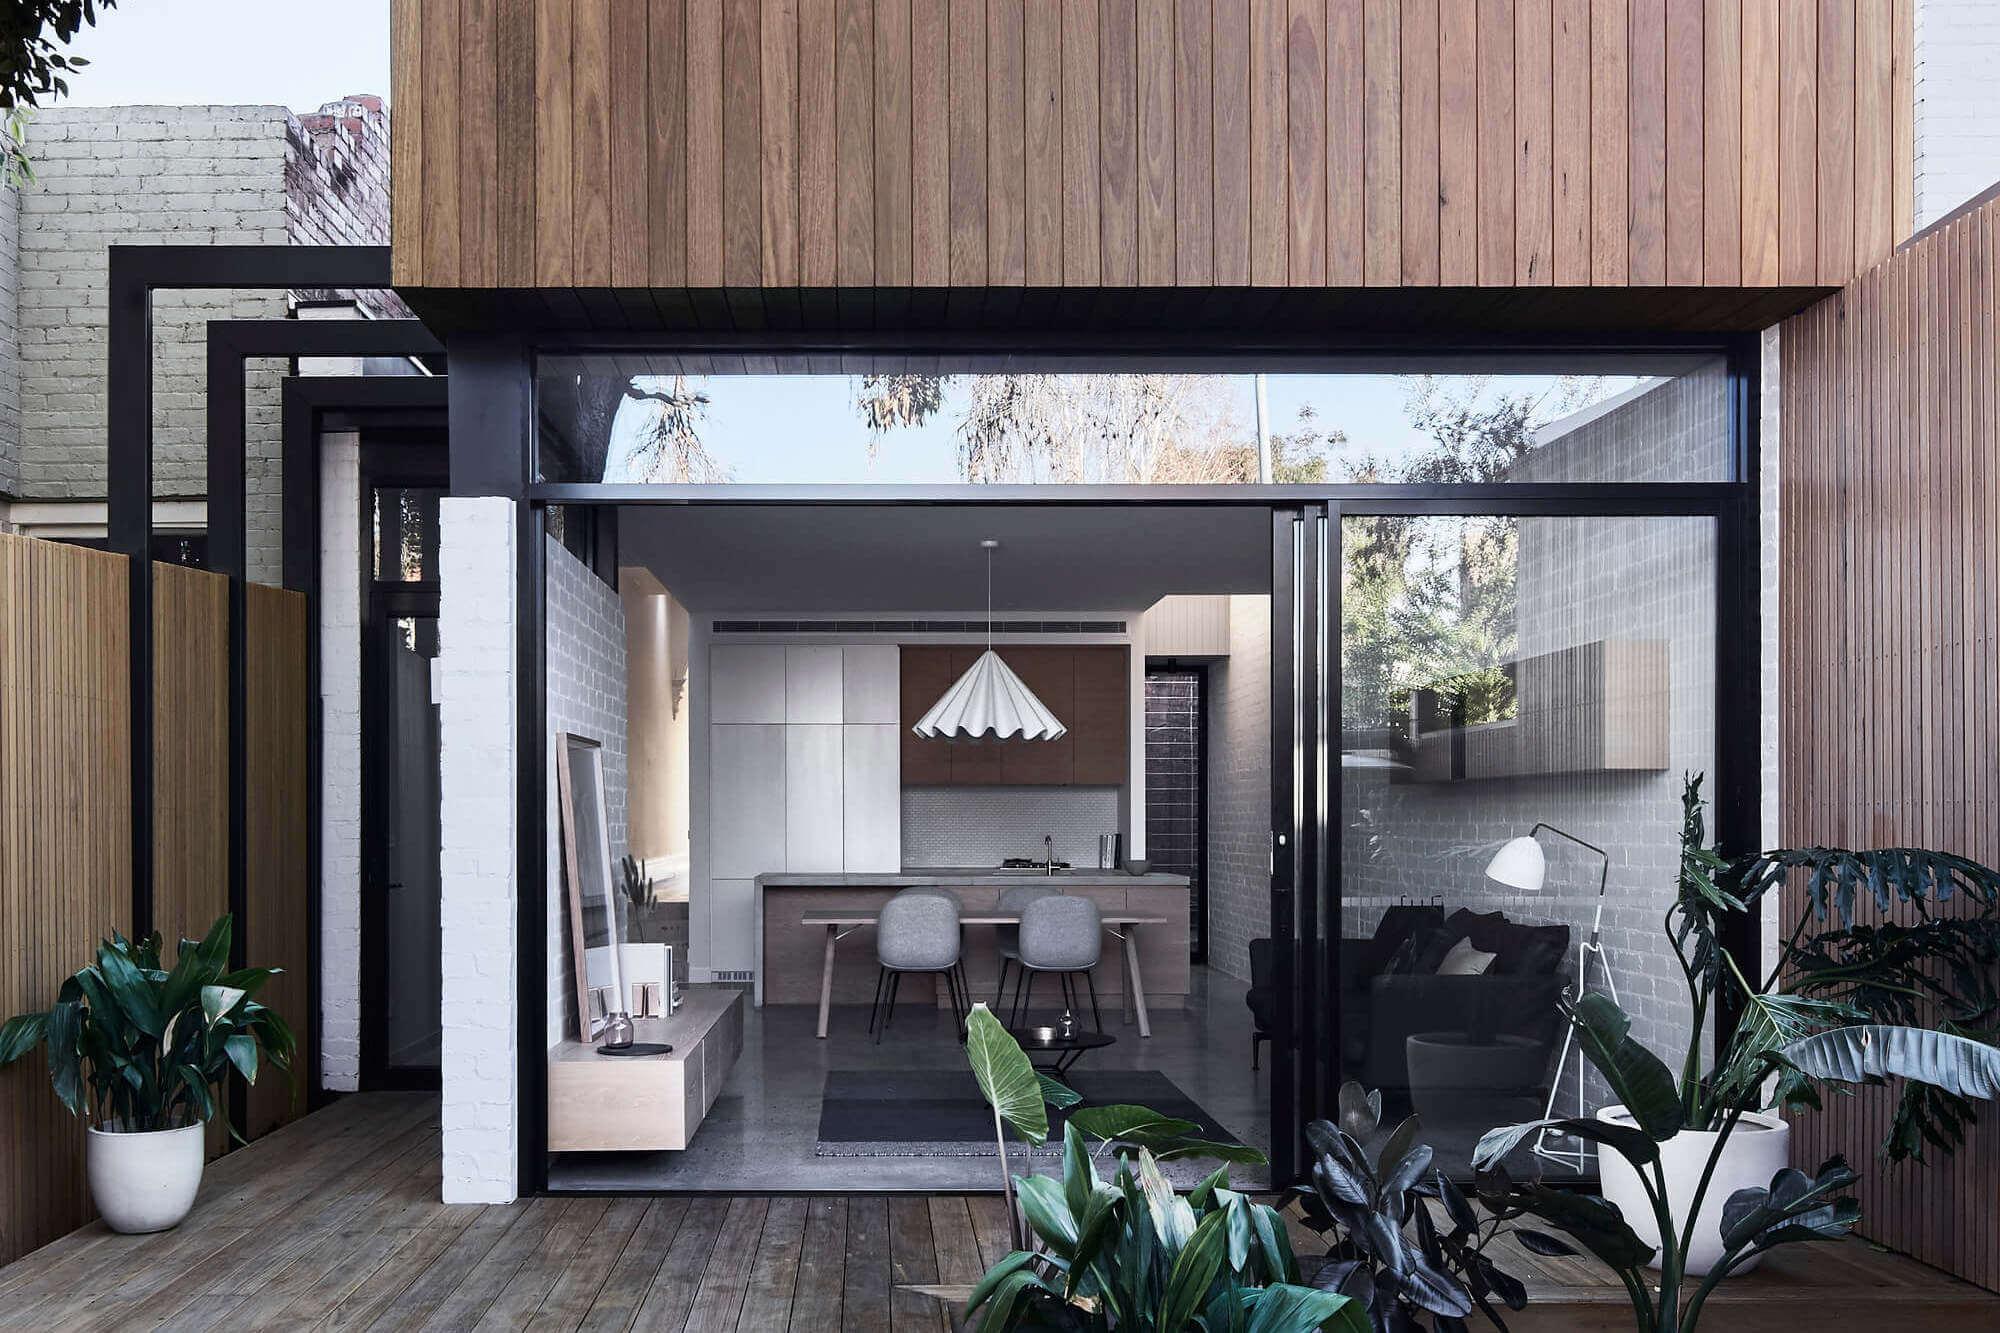 Loft House by Tom Robertson Architects